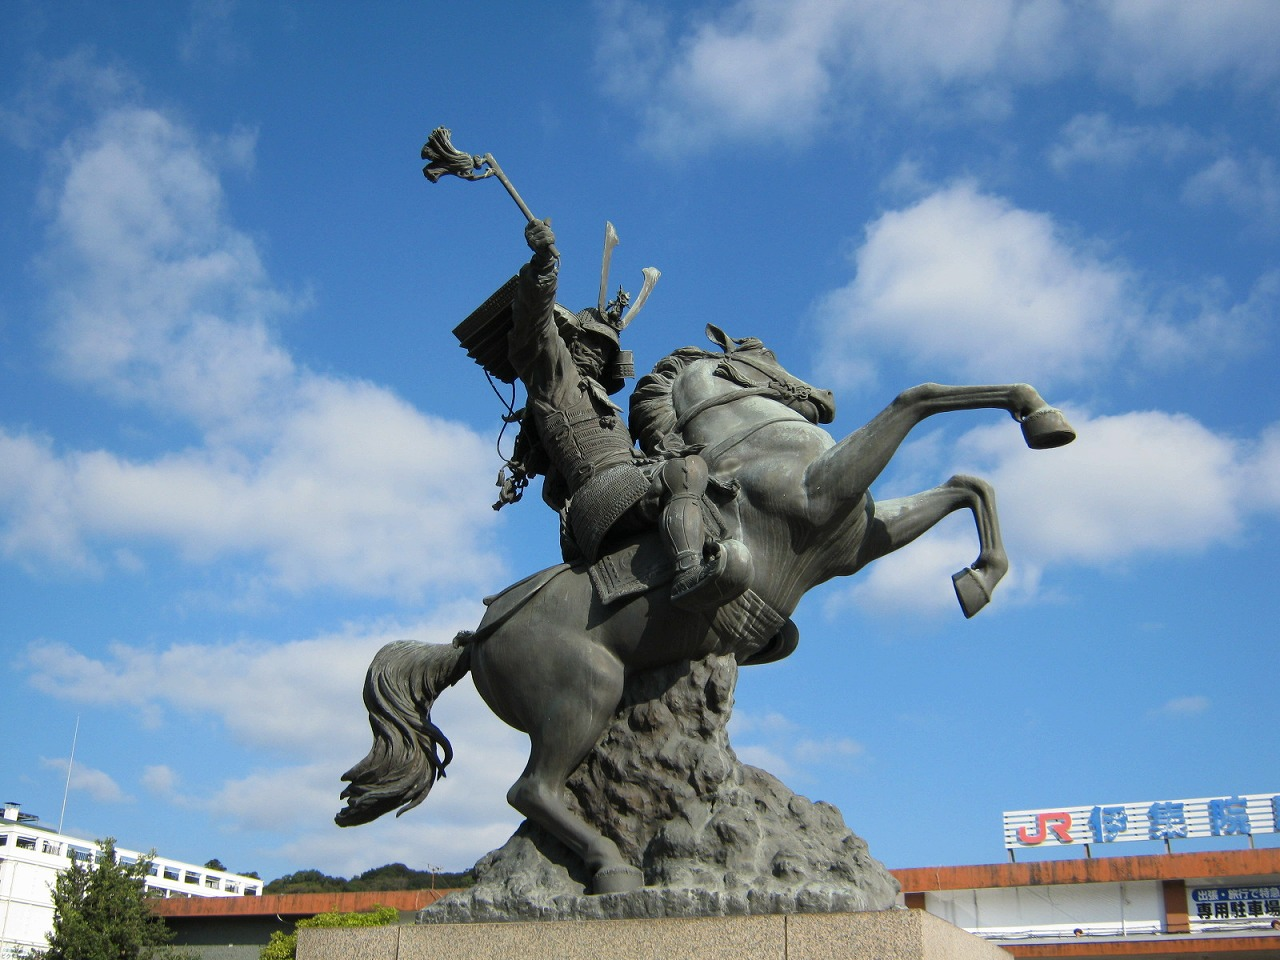 ken's銅像探索日誌 島津 義弘